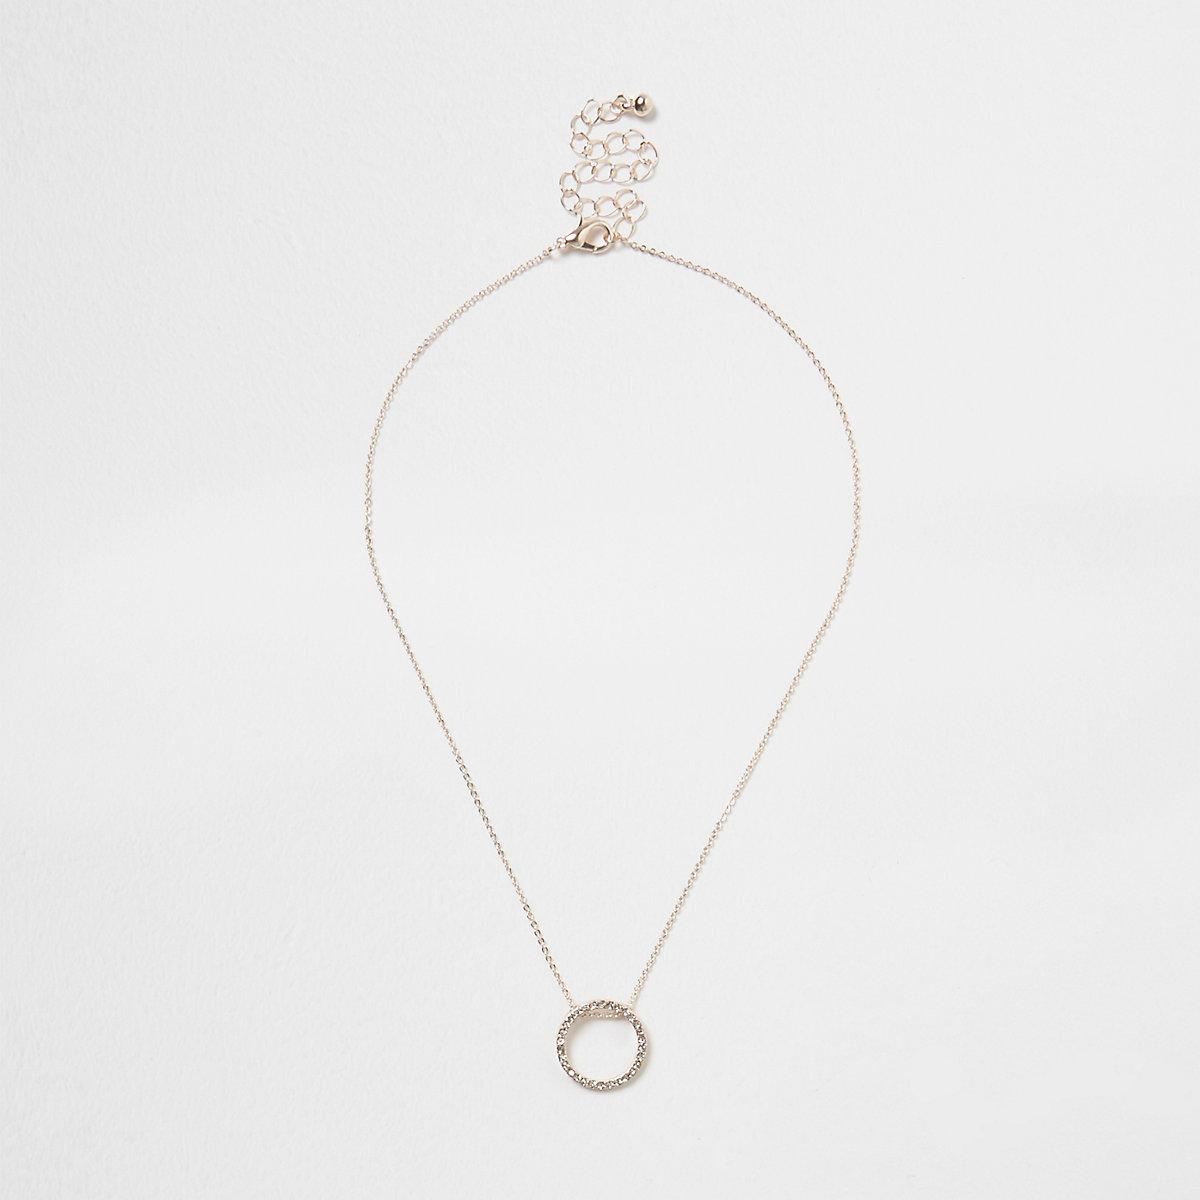 Rose gold tone rhinestone pave circle necklace